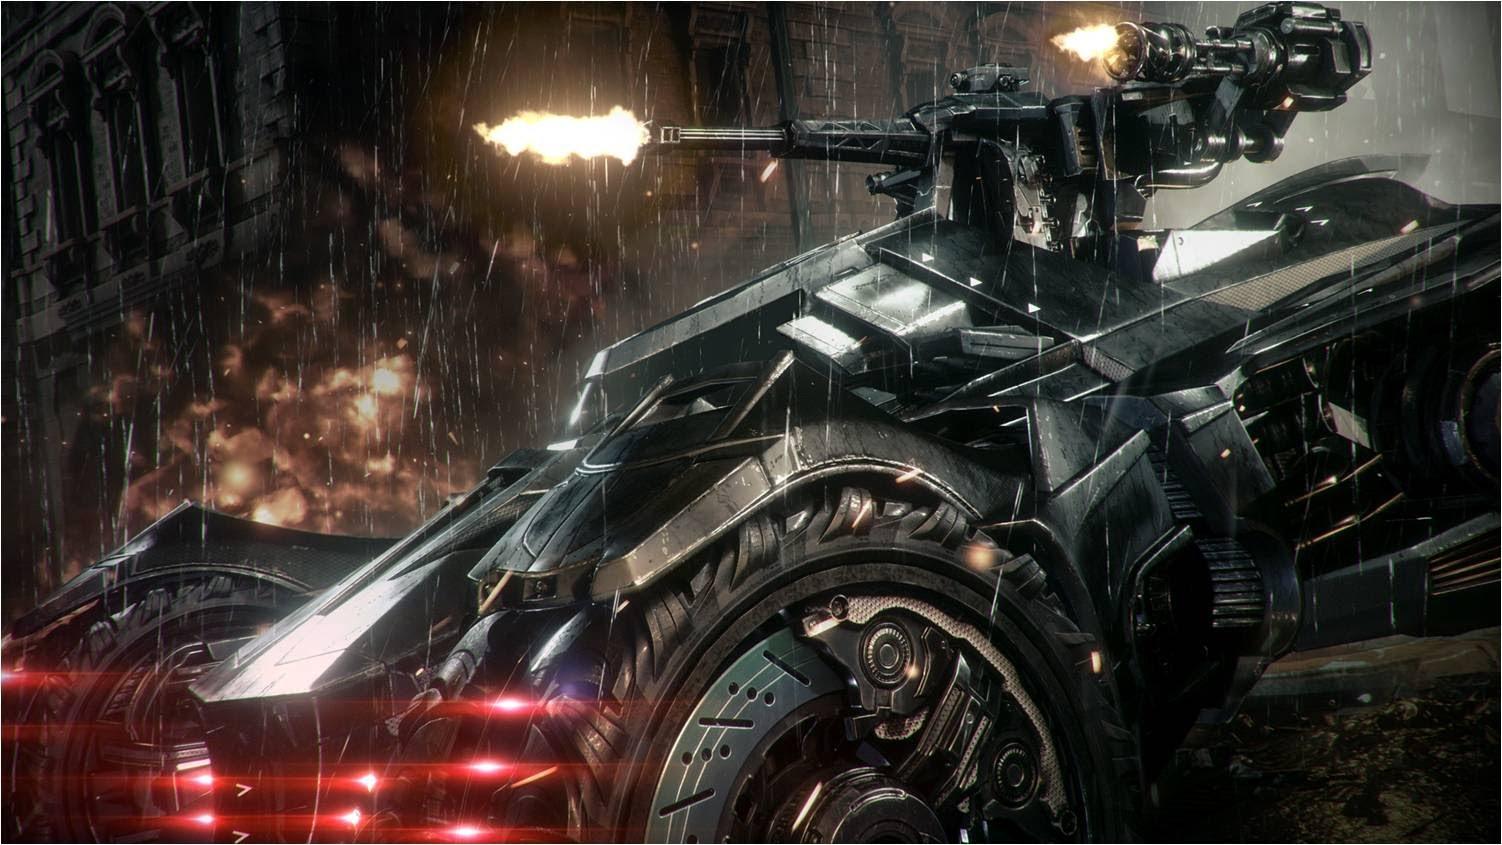 Batmobile 17 Background